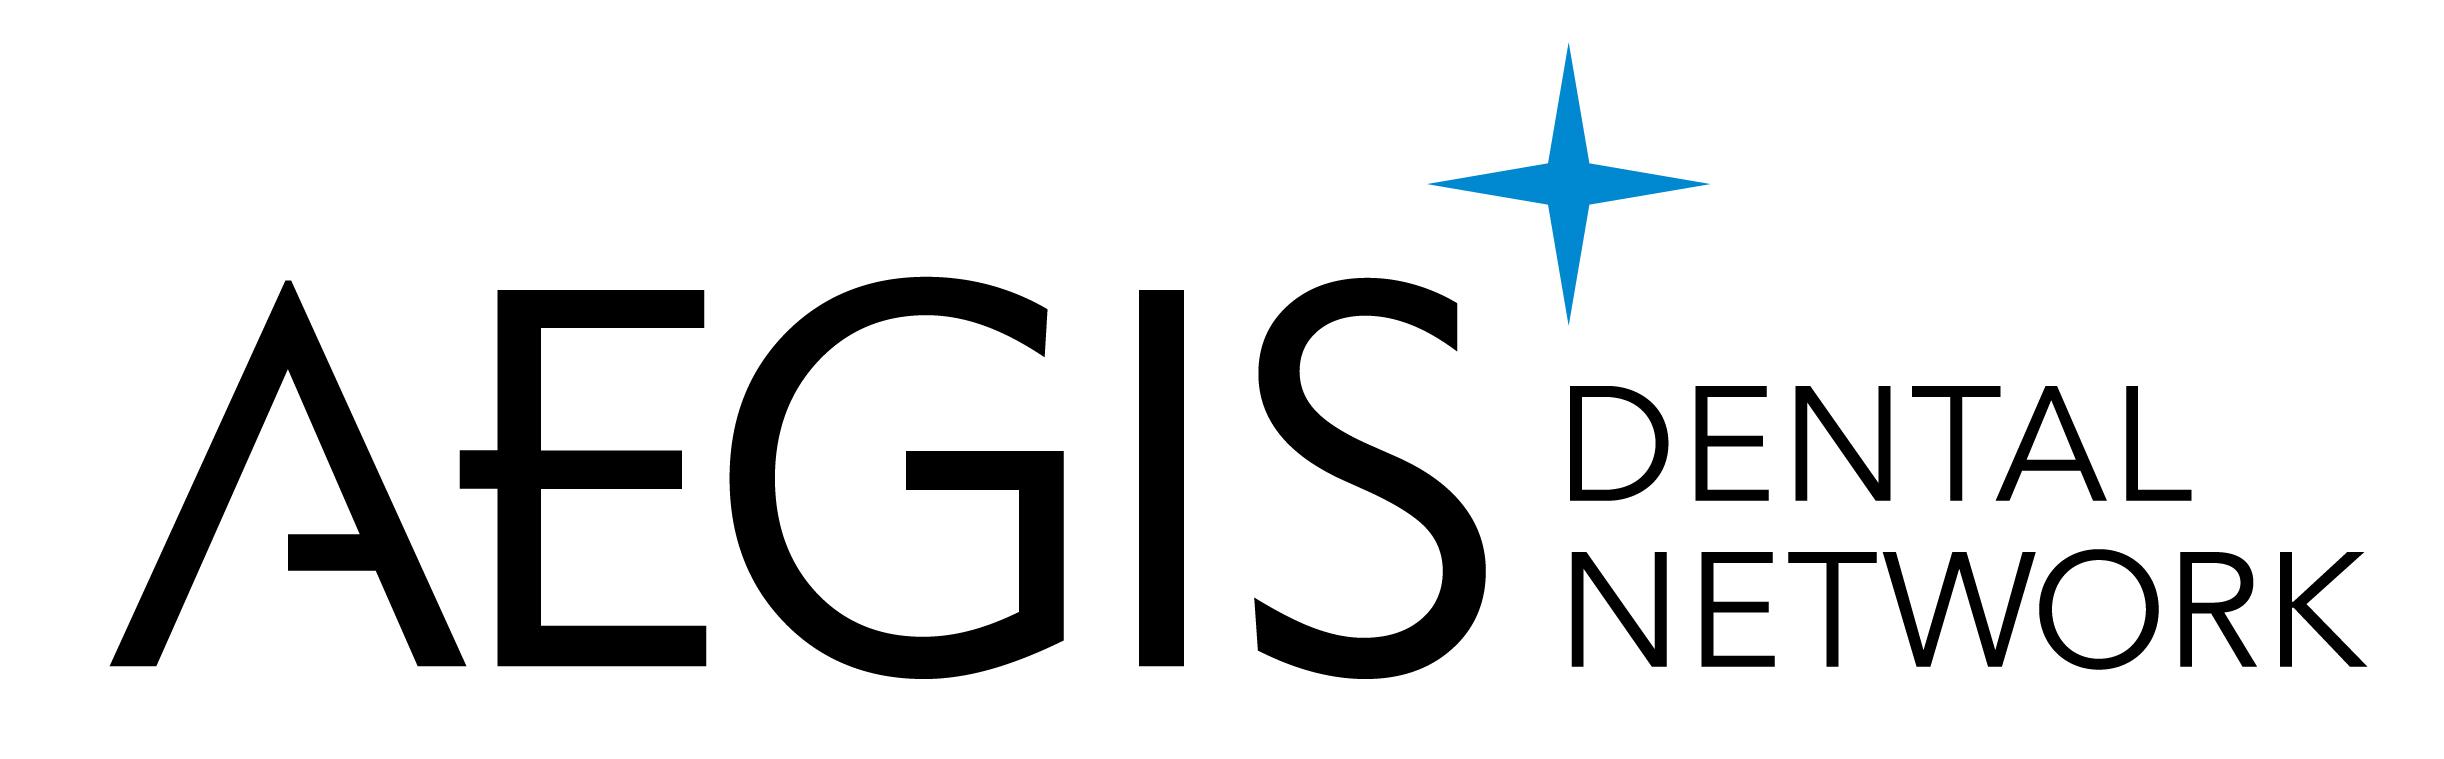 AEGIS Dental Network Logo